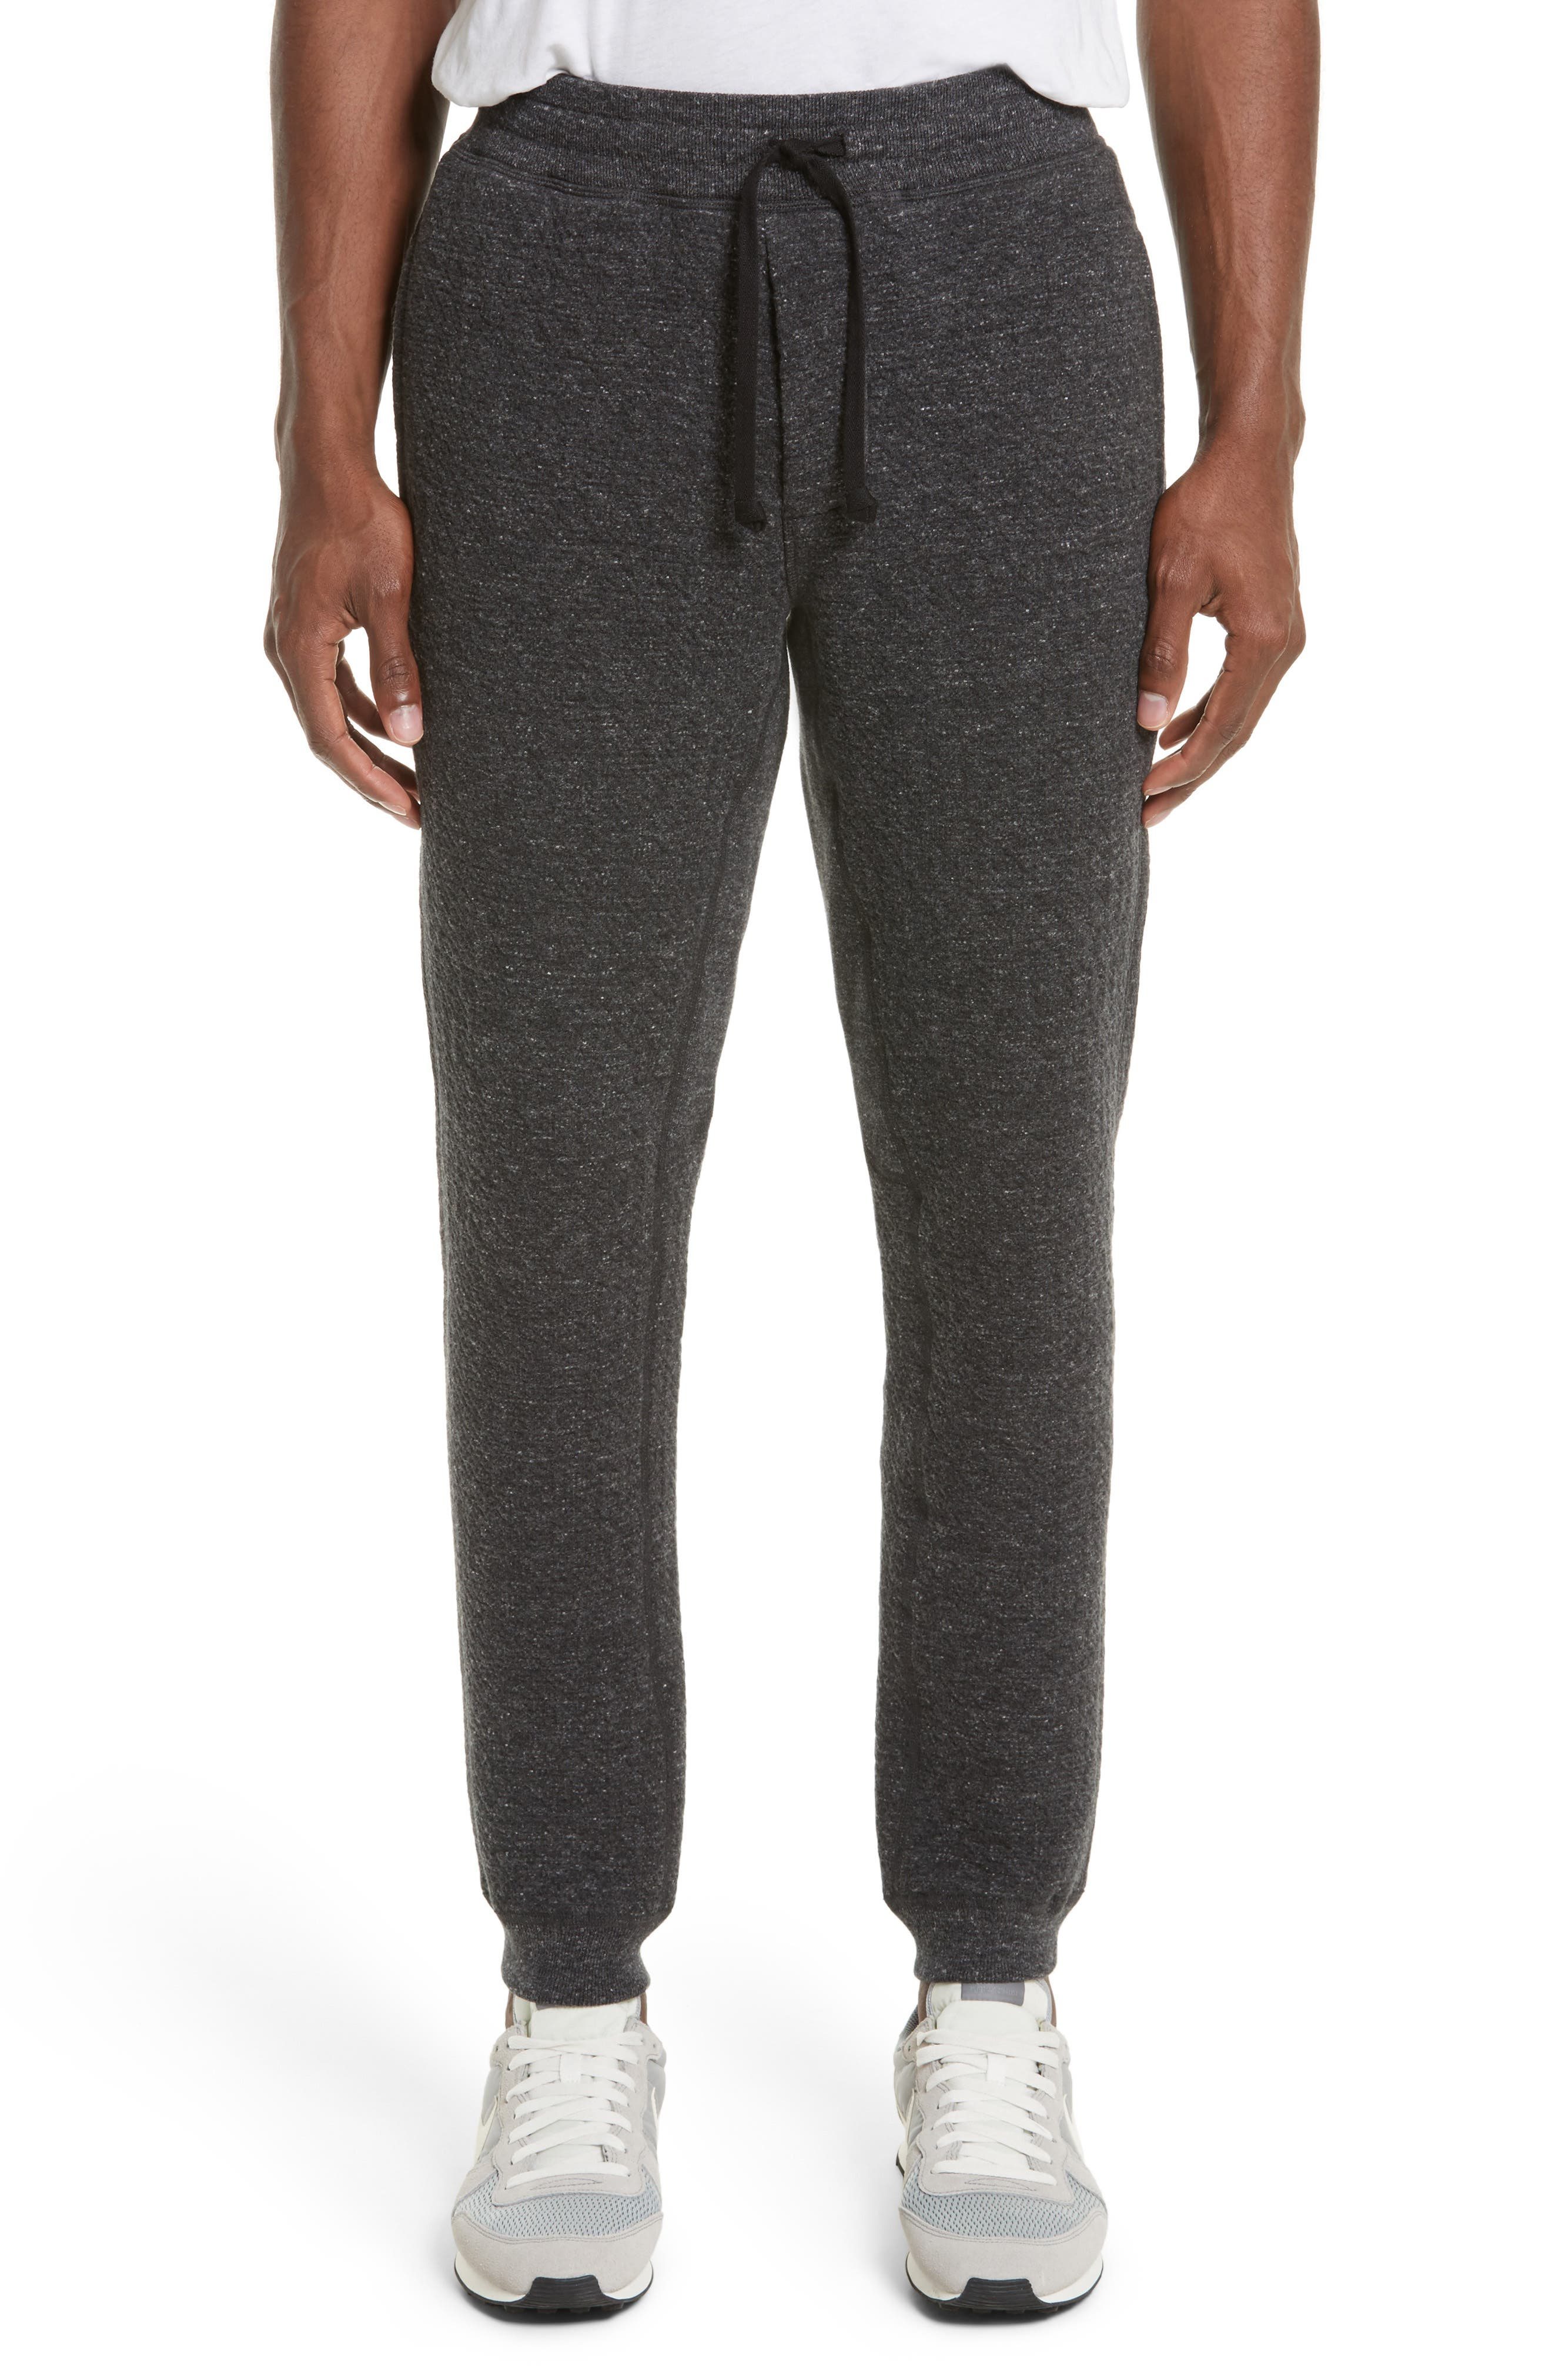 Cabin Fleece Sweatpants,                         Main,                         color, Charcoal